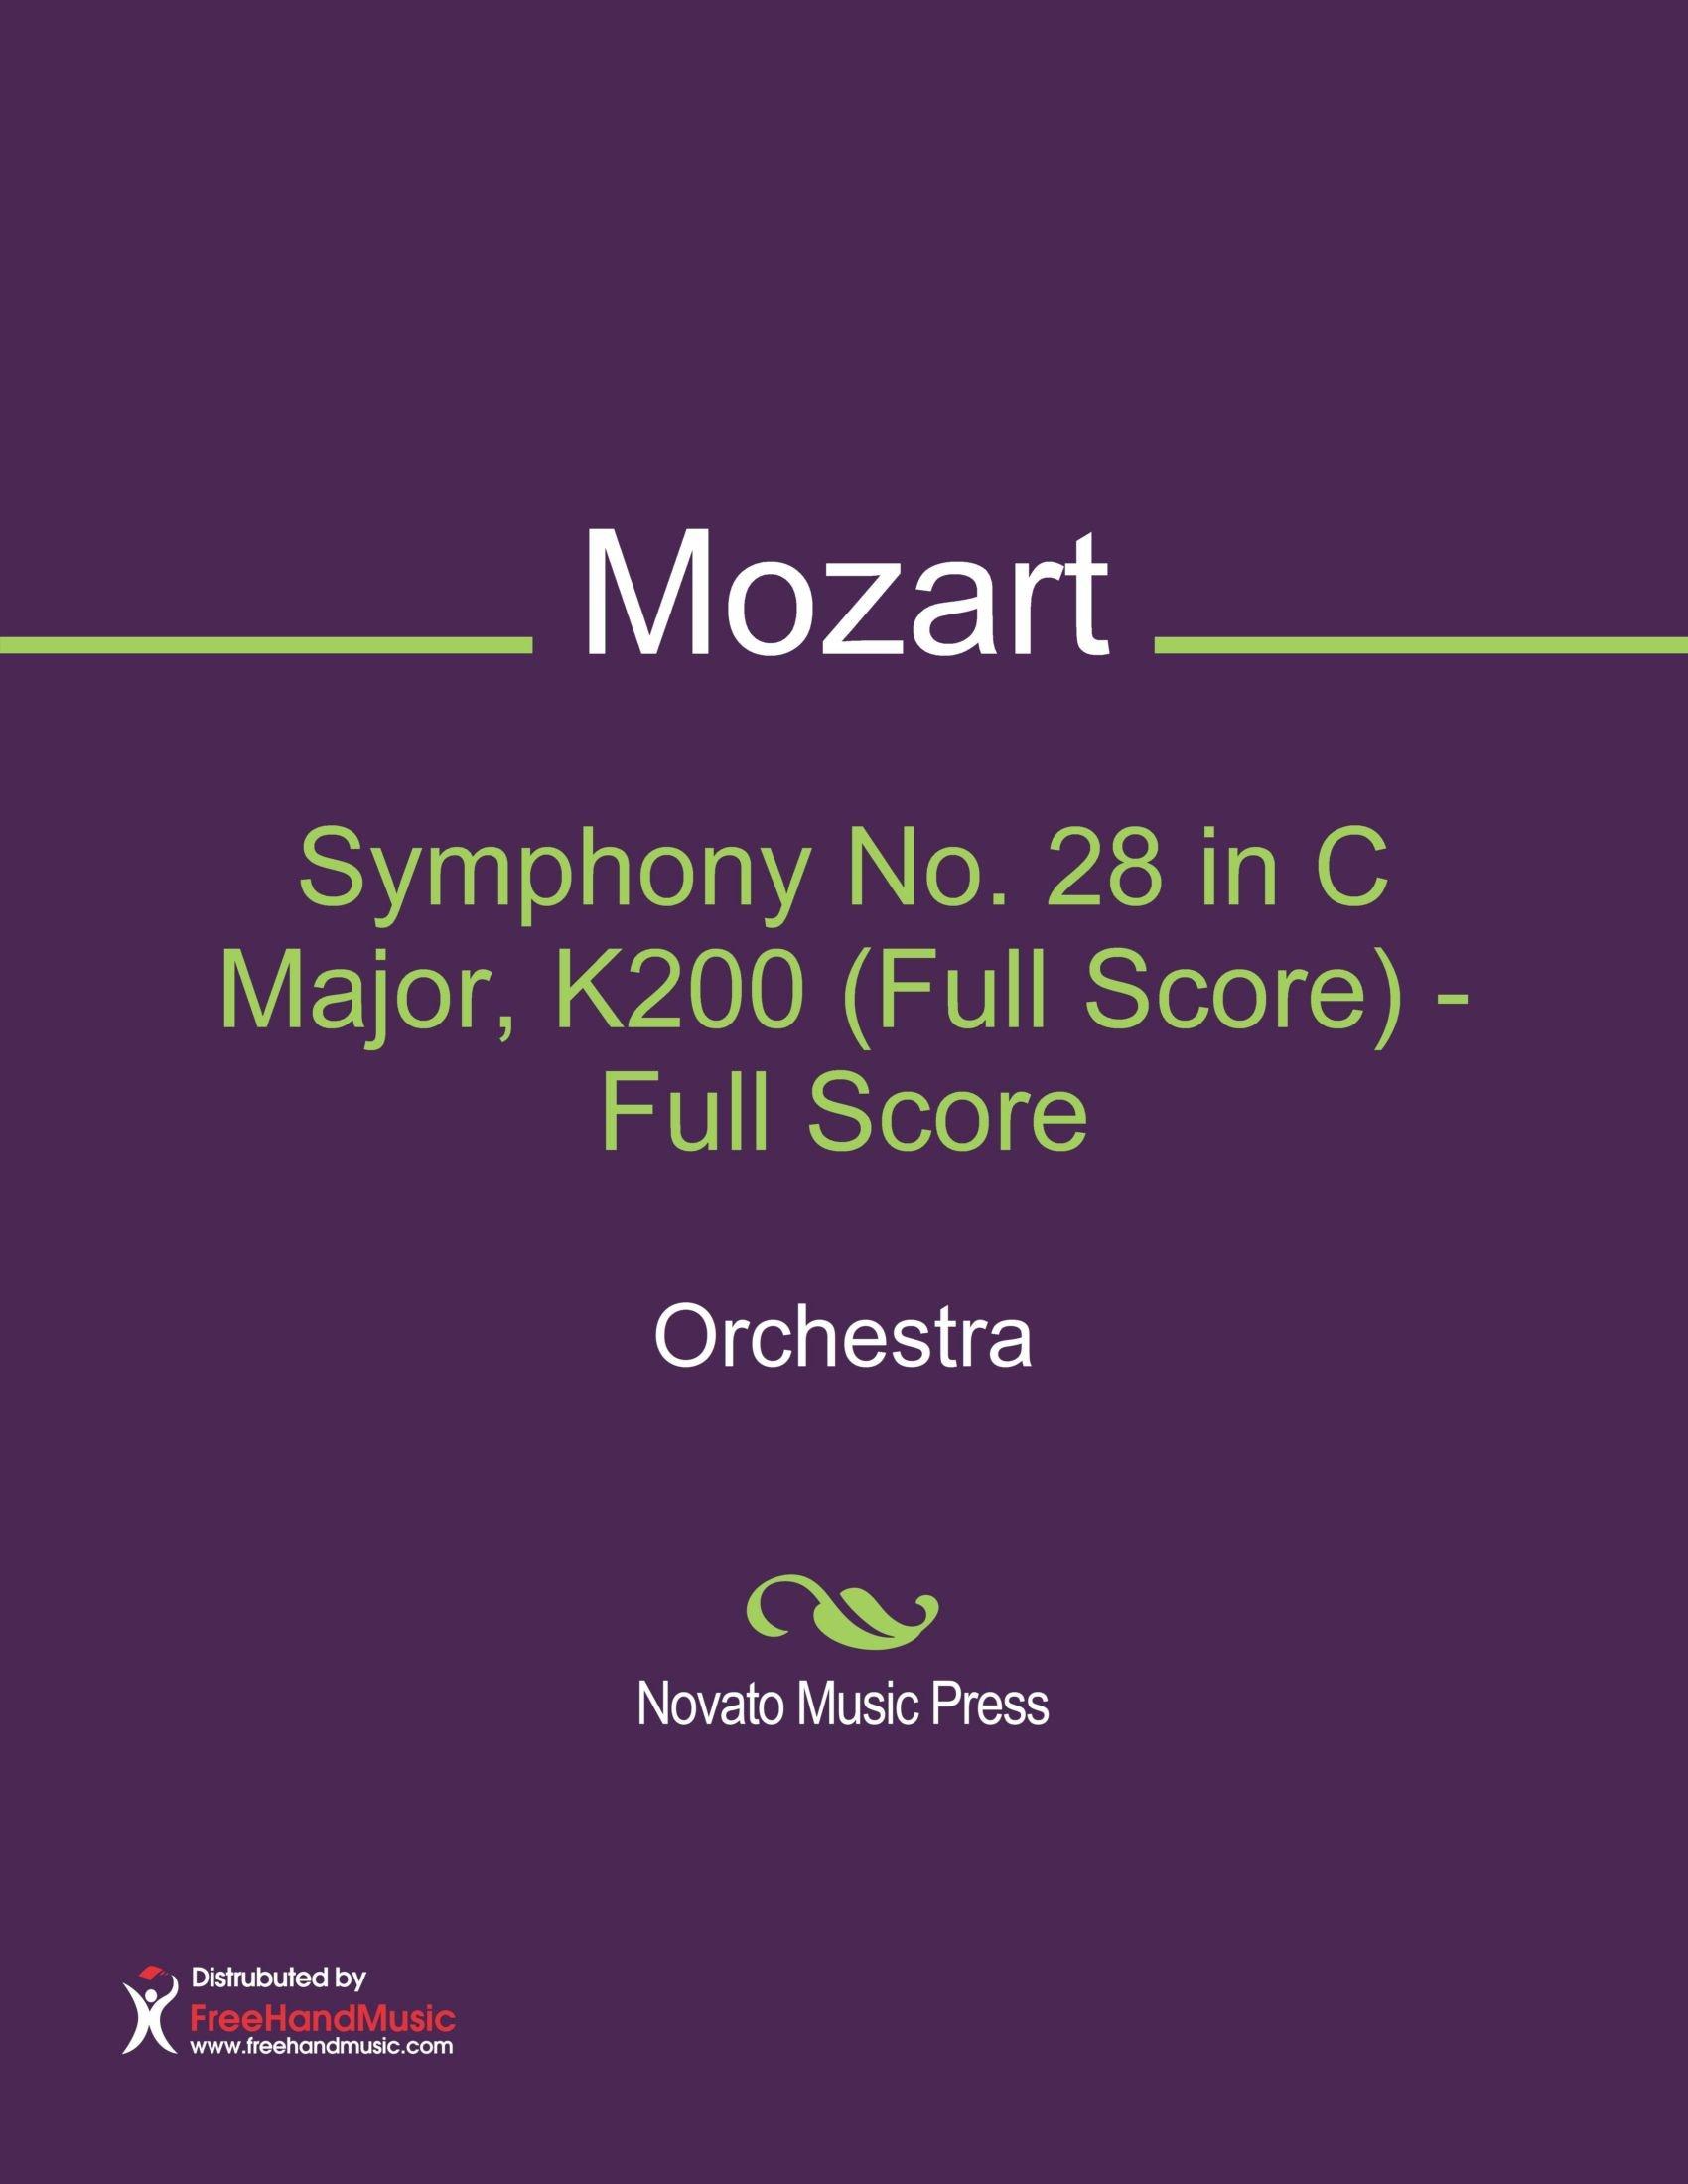 Symphony No. 28 in C Major, K200 (Full Score)